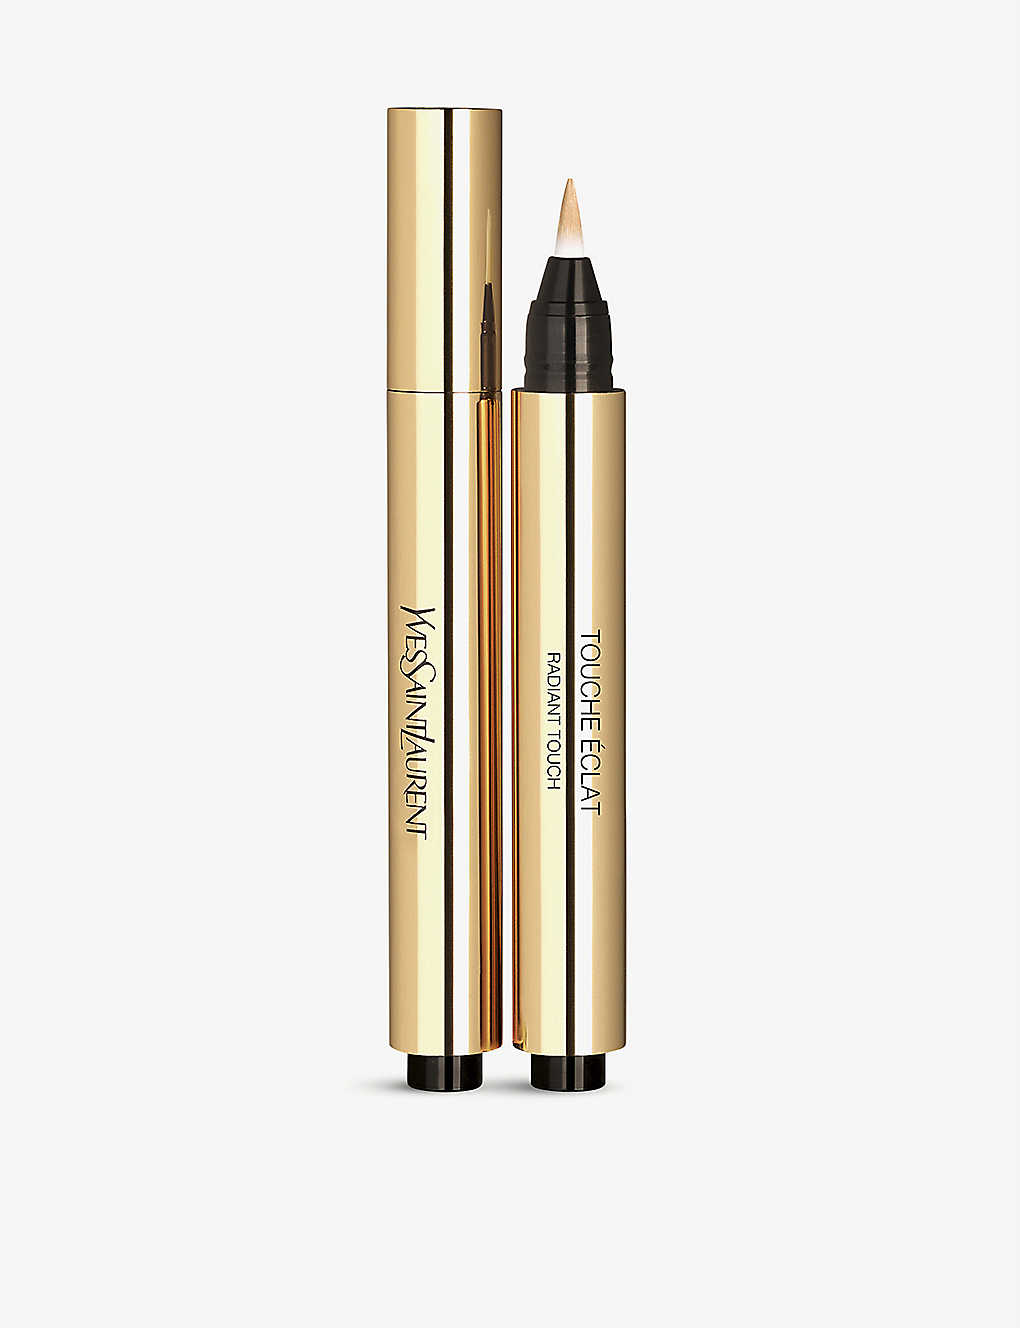 YVES SAINT LAURENT: Touche Éclat Illuminating Pen 2.5ml